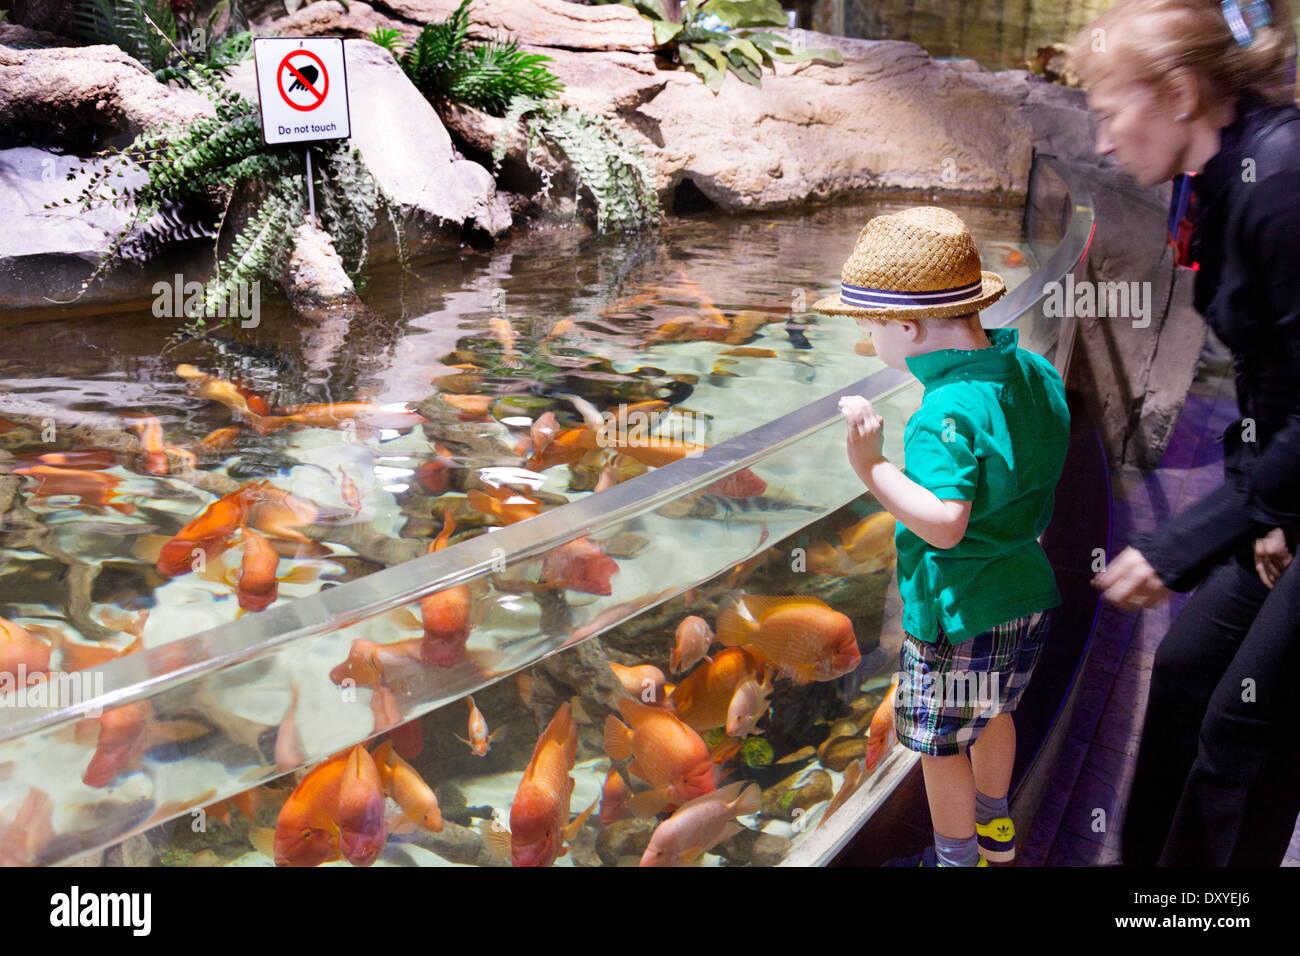 A mother and child looking at fish, Dubai Aquarium and Underwater Zoo, Dubai Mall, UAE, United Arab Emirates Stock Photo